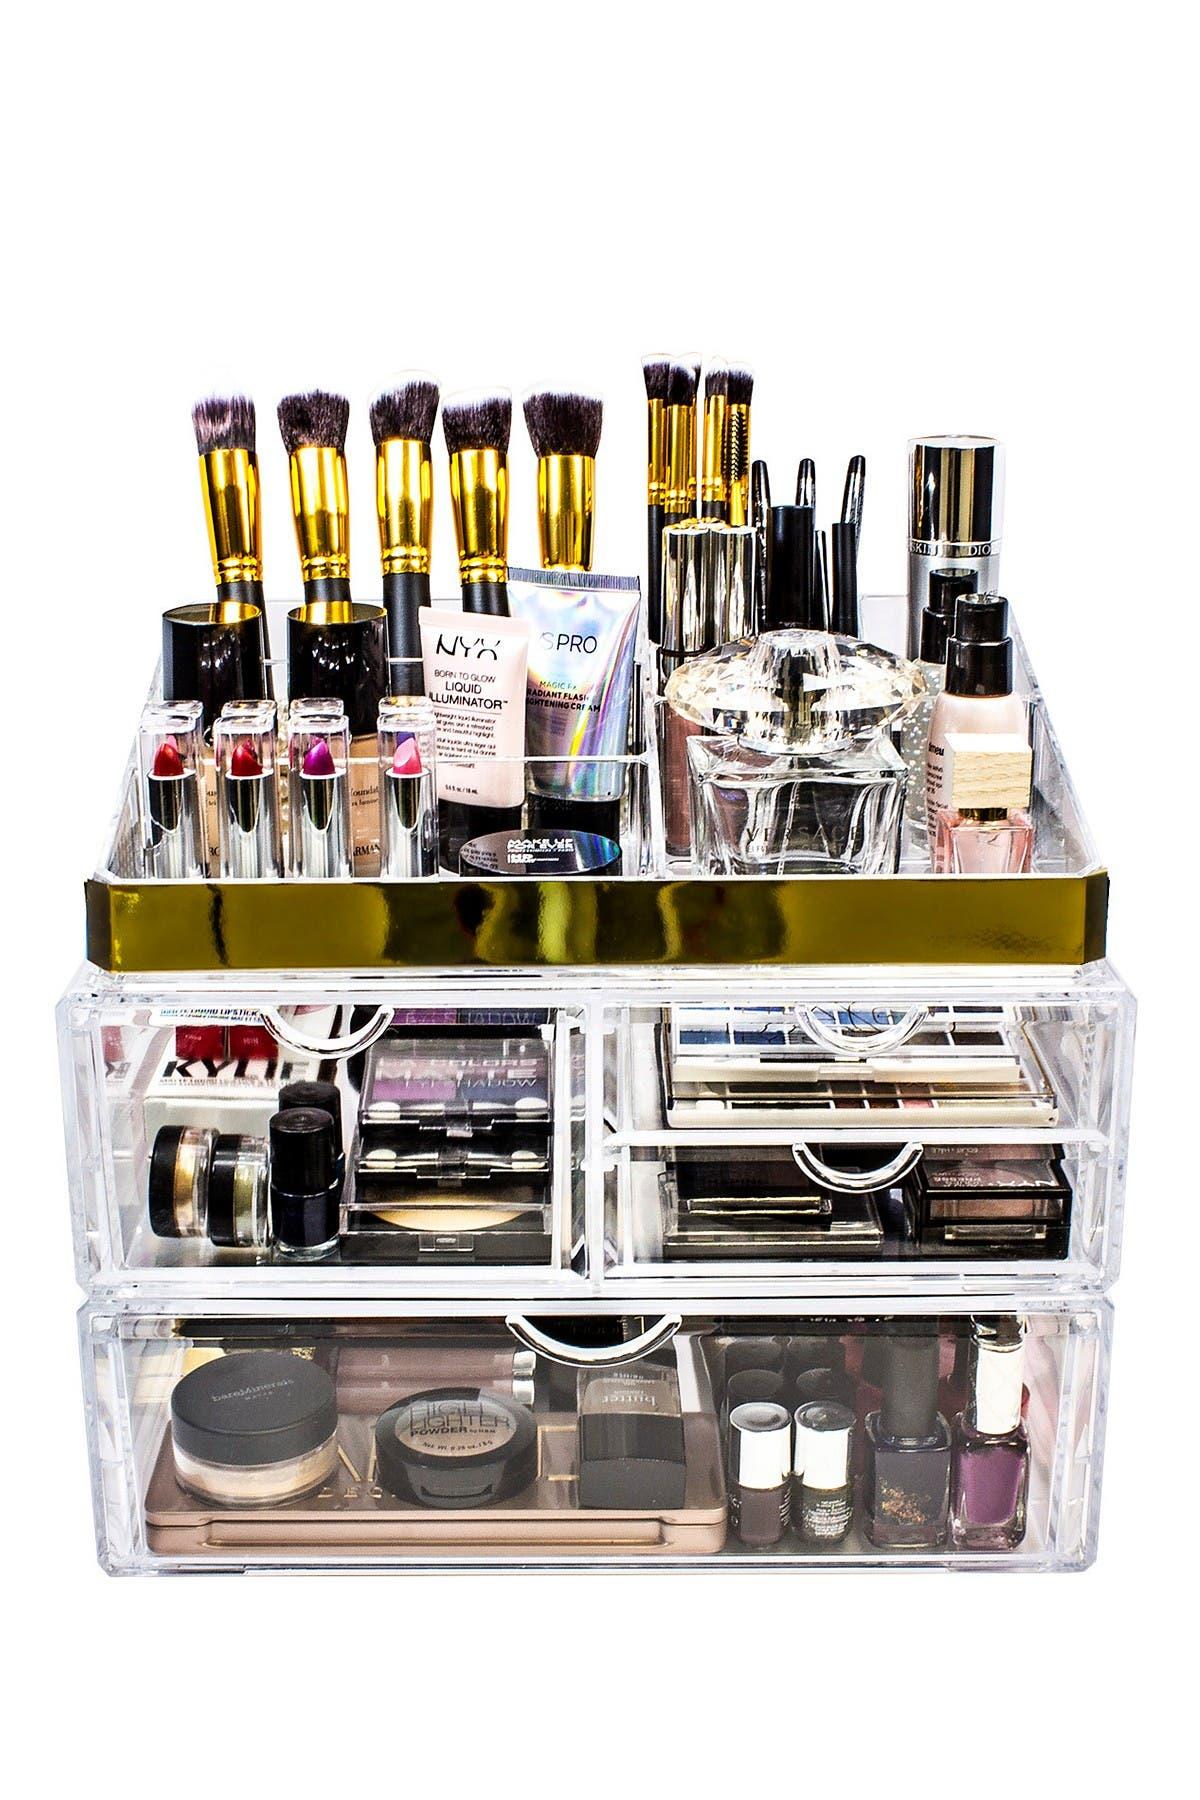 Image of Sorbus X-Large Two Piece Makeup Storage Organizer - Gold